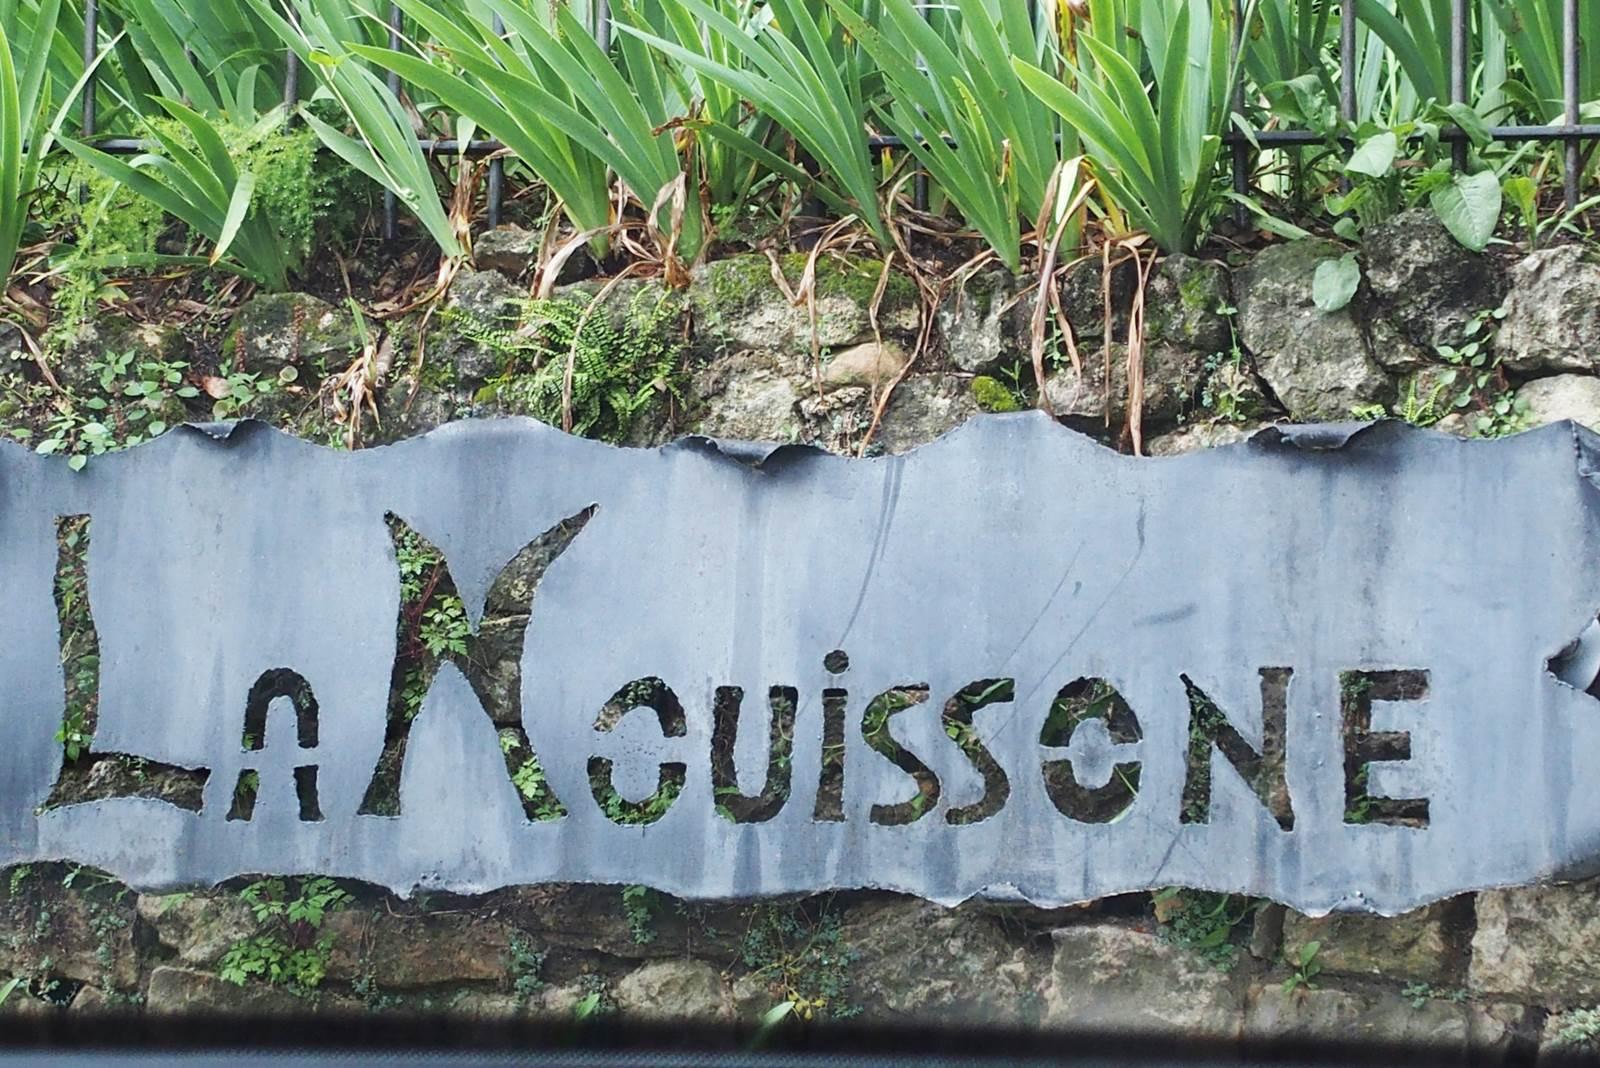 La Mouissone